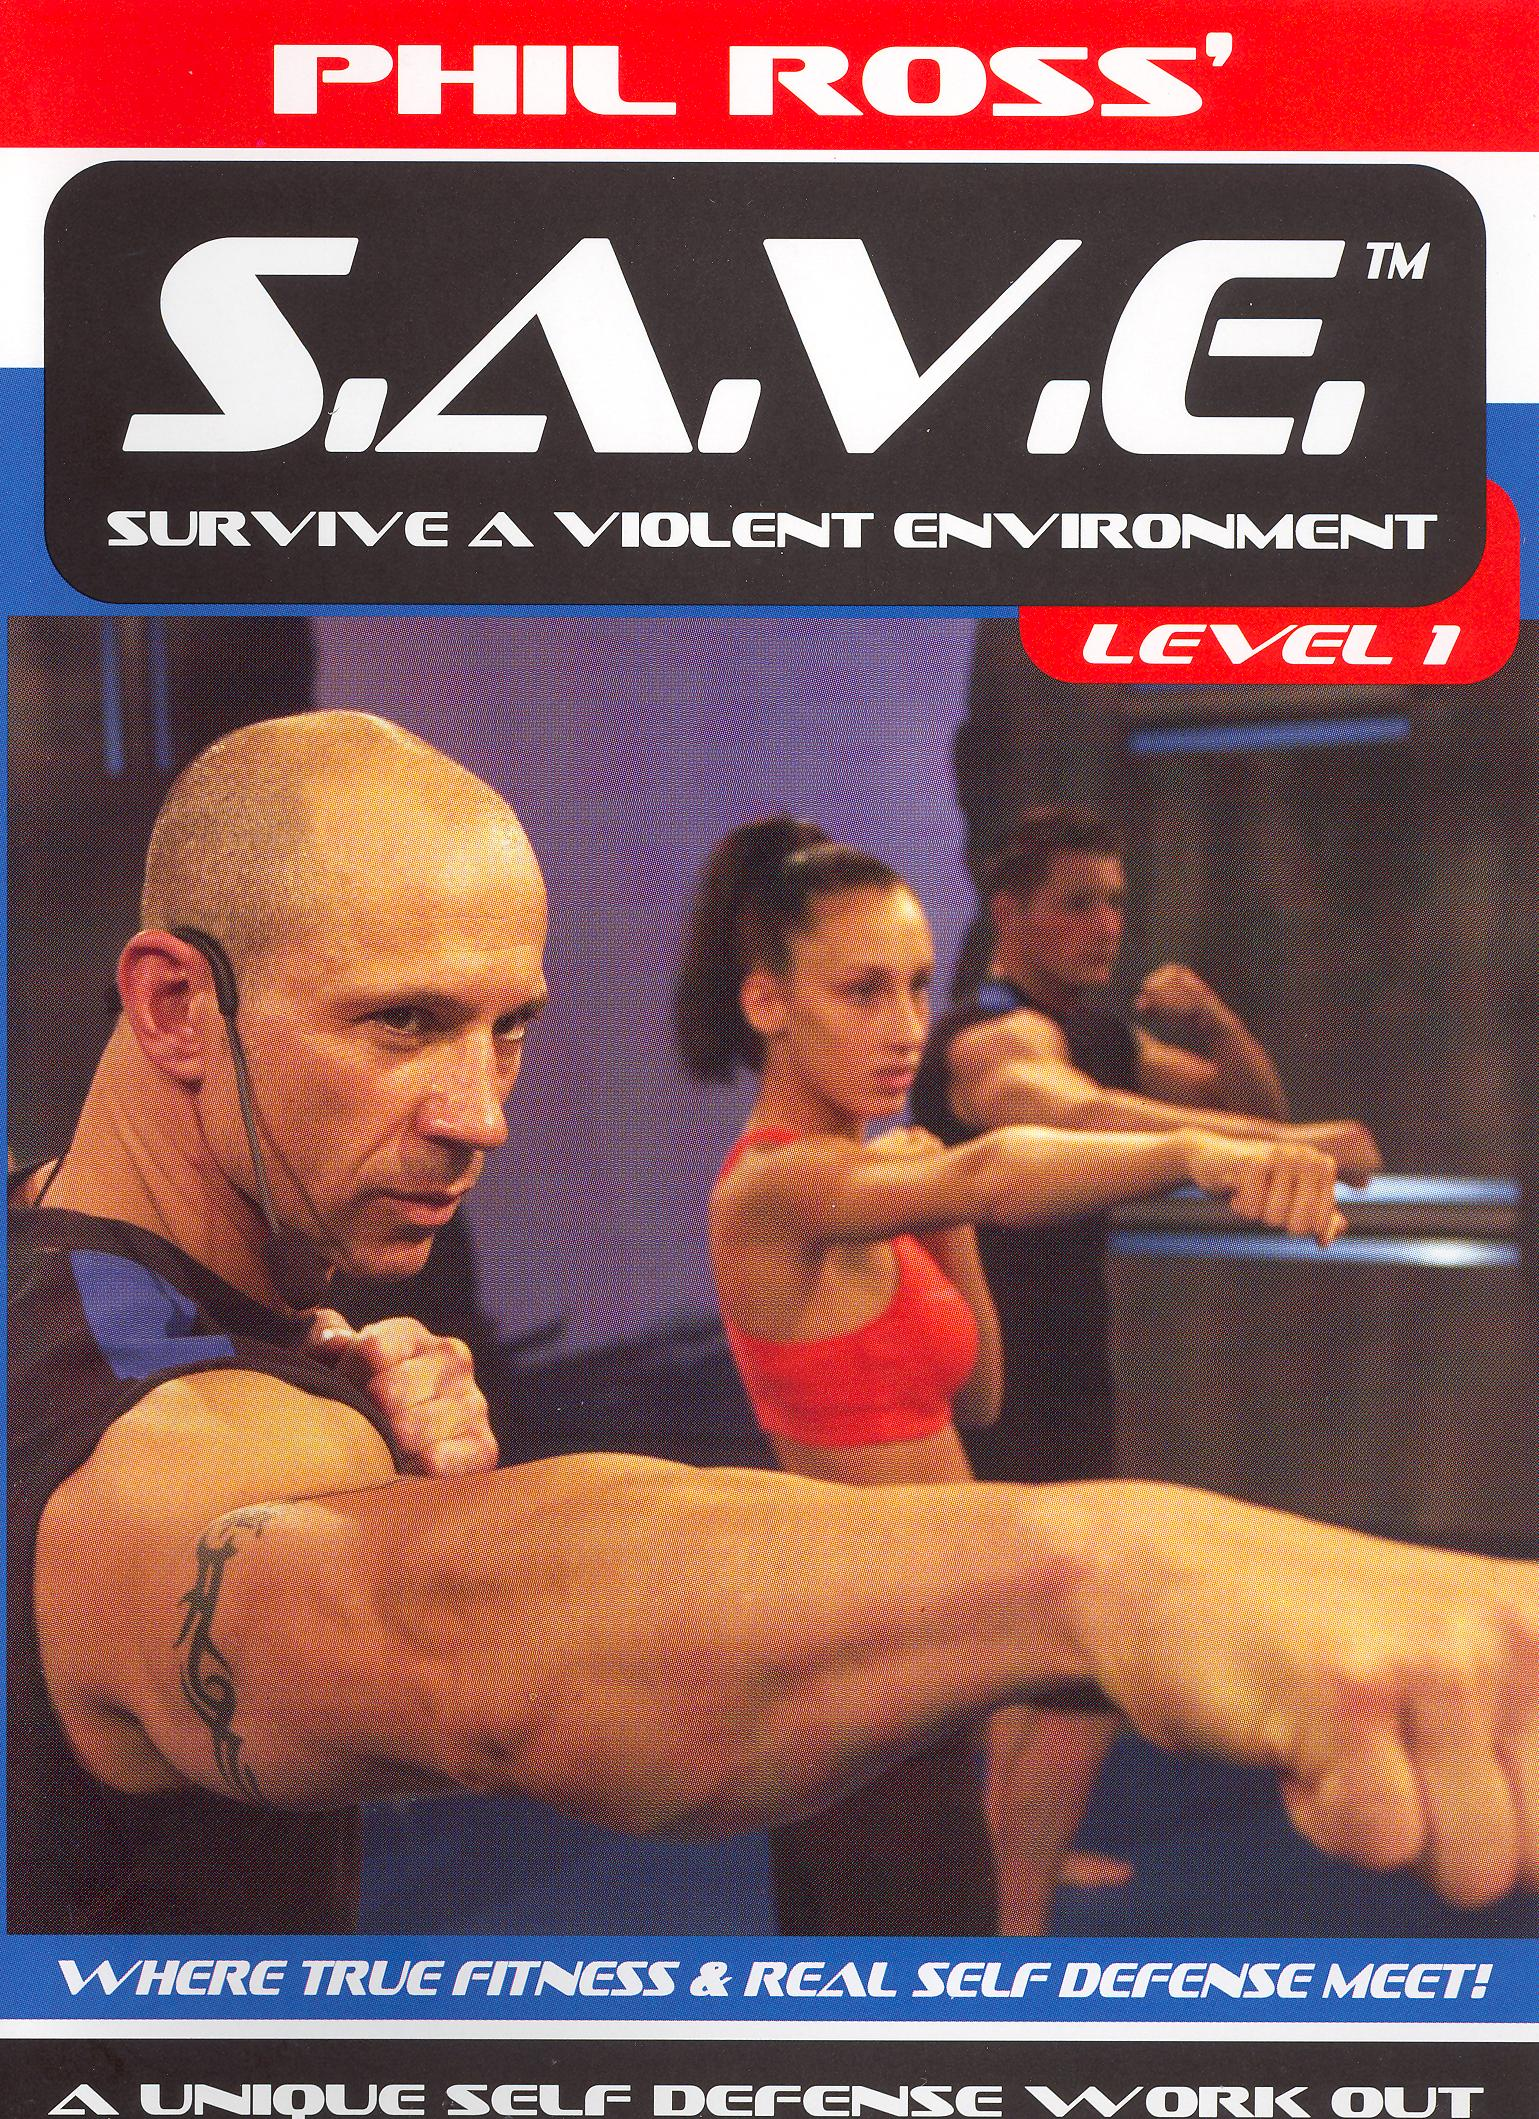 S.A.V.E.: Survive a Violent Environment, Vol. 1 - Fitness and Self Defense